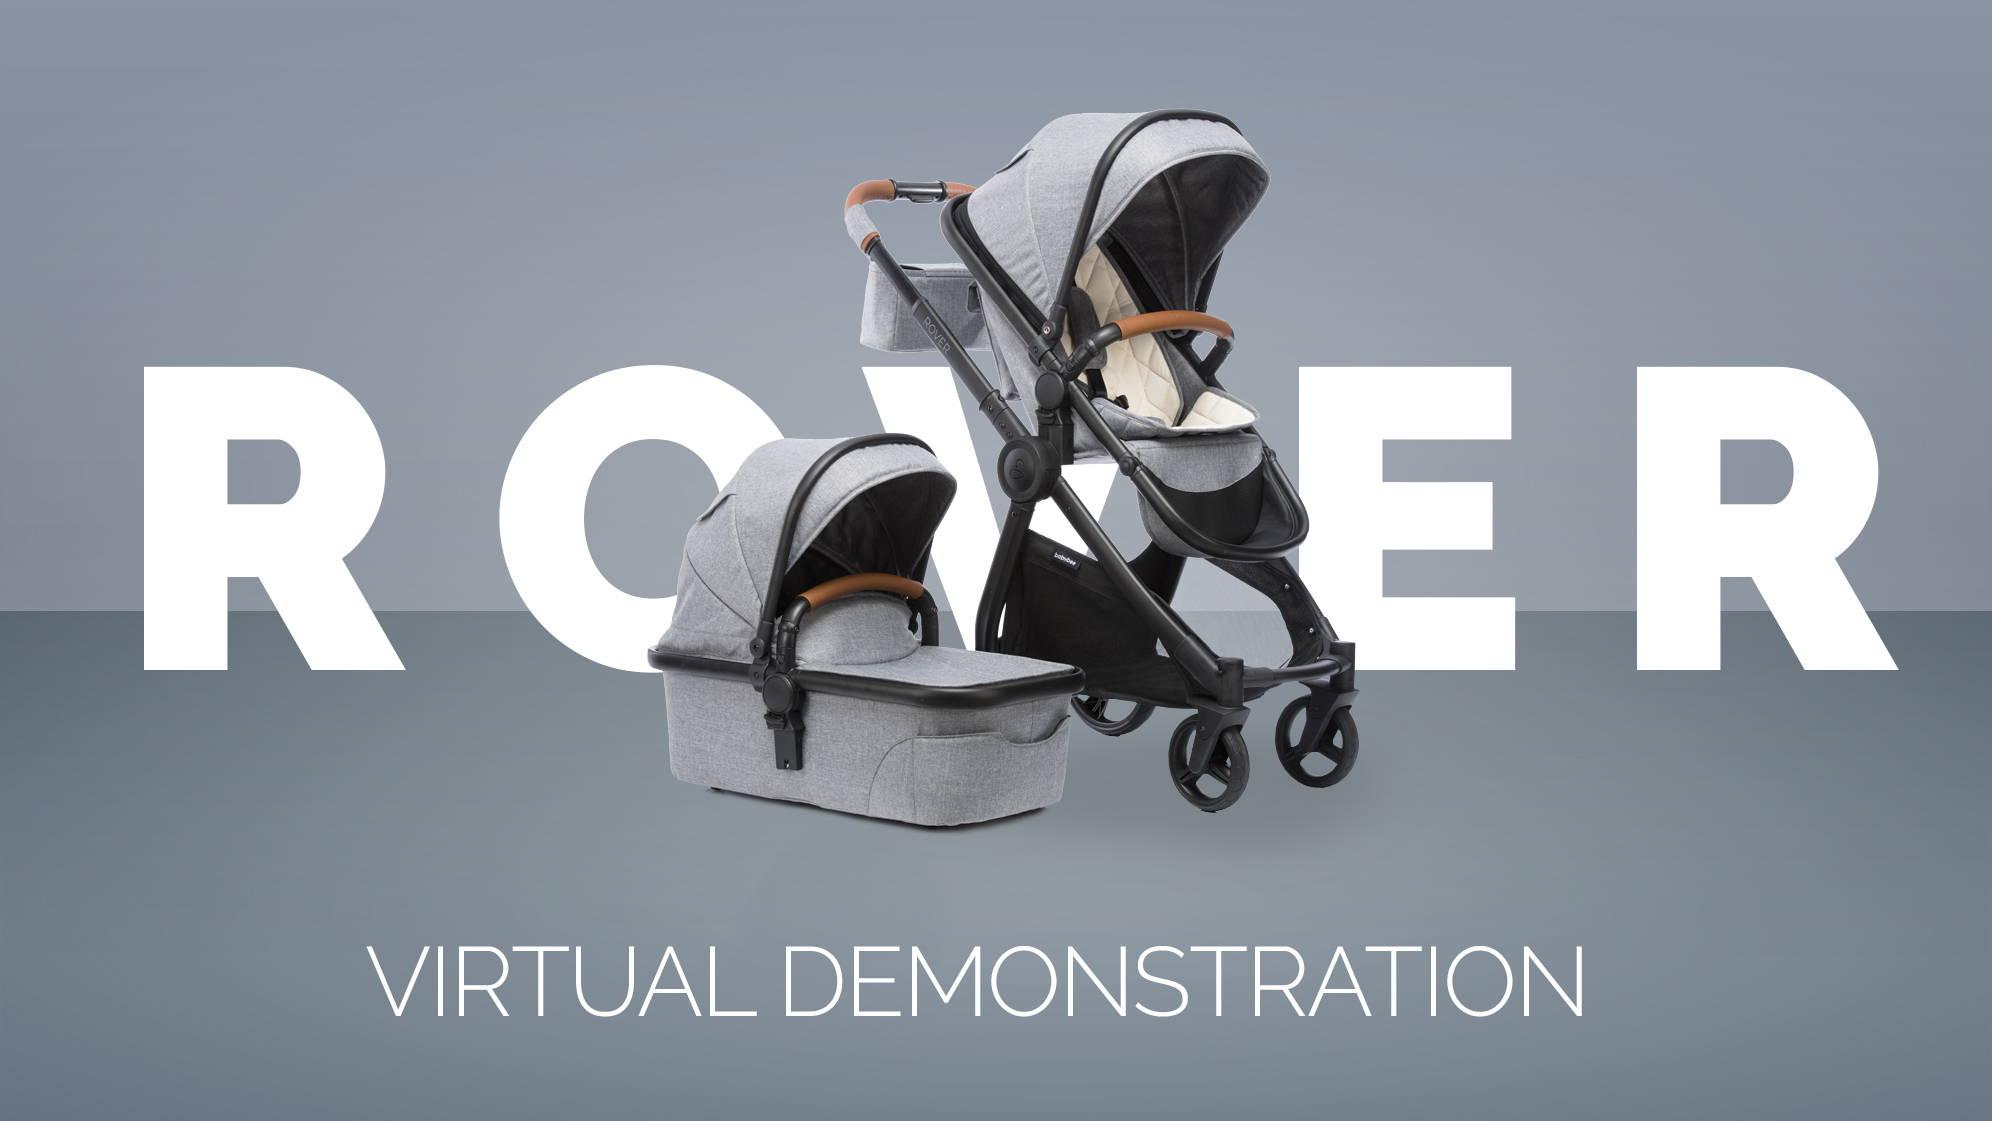 Babybee ROVER Virtual Demonstration